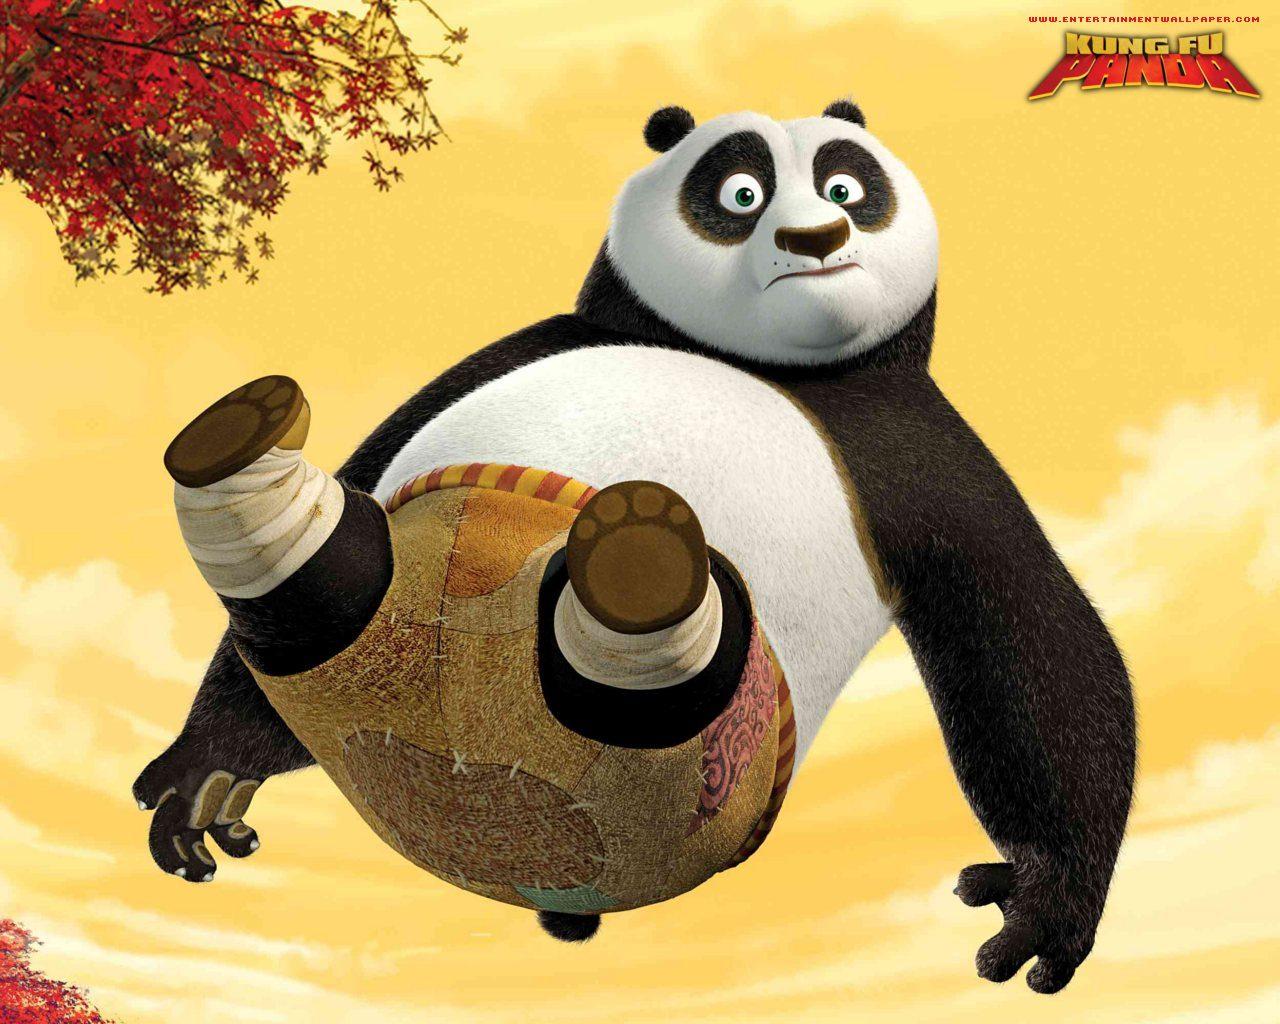 Kung Fu Panda Wallpaper (Page 2)